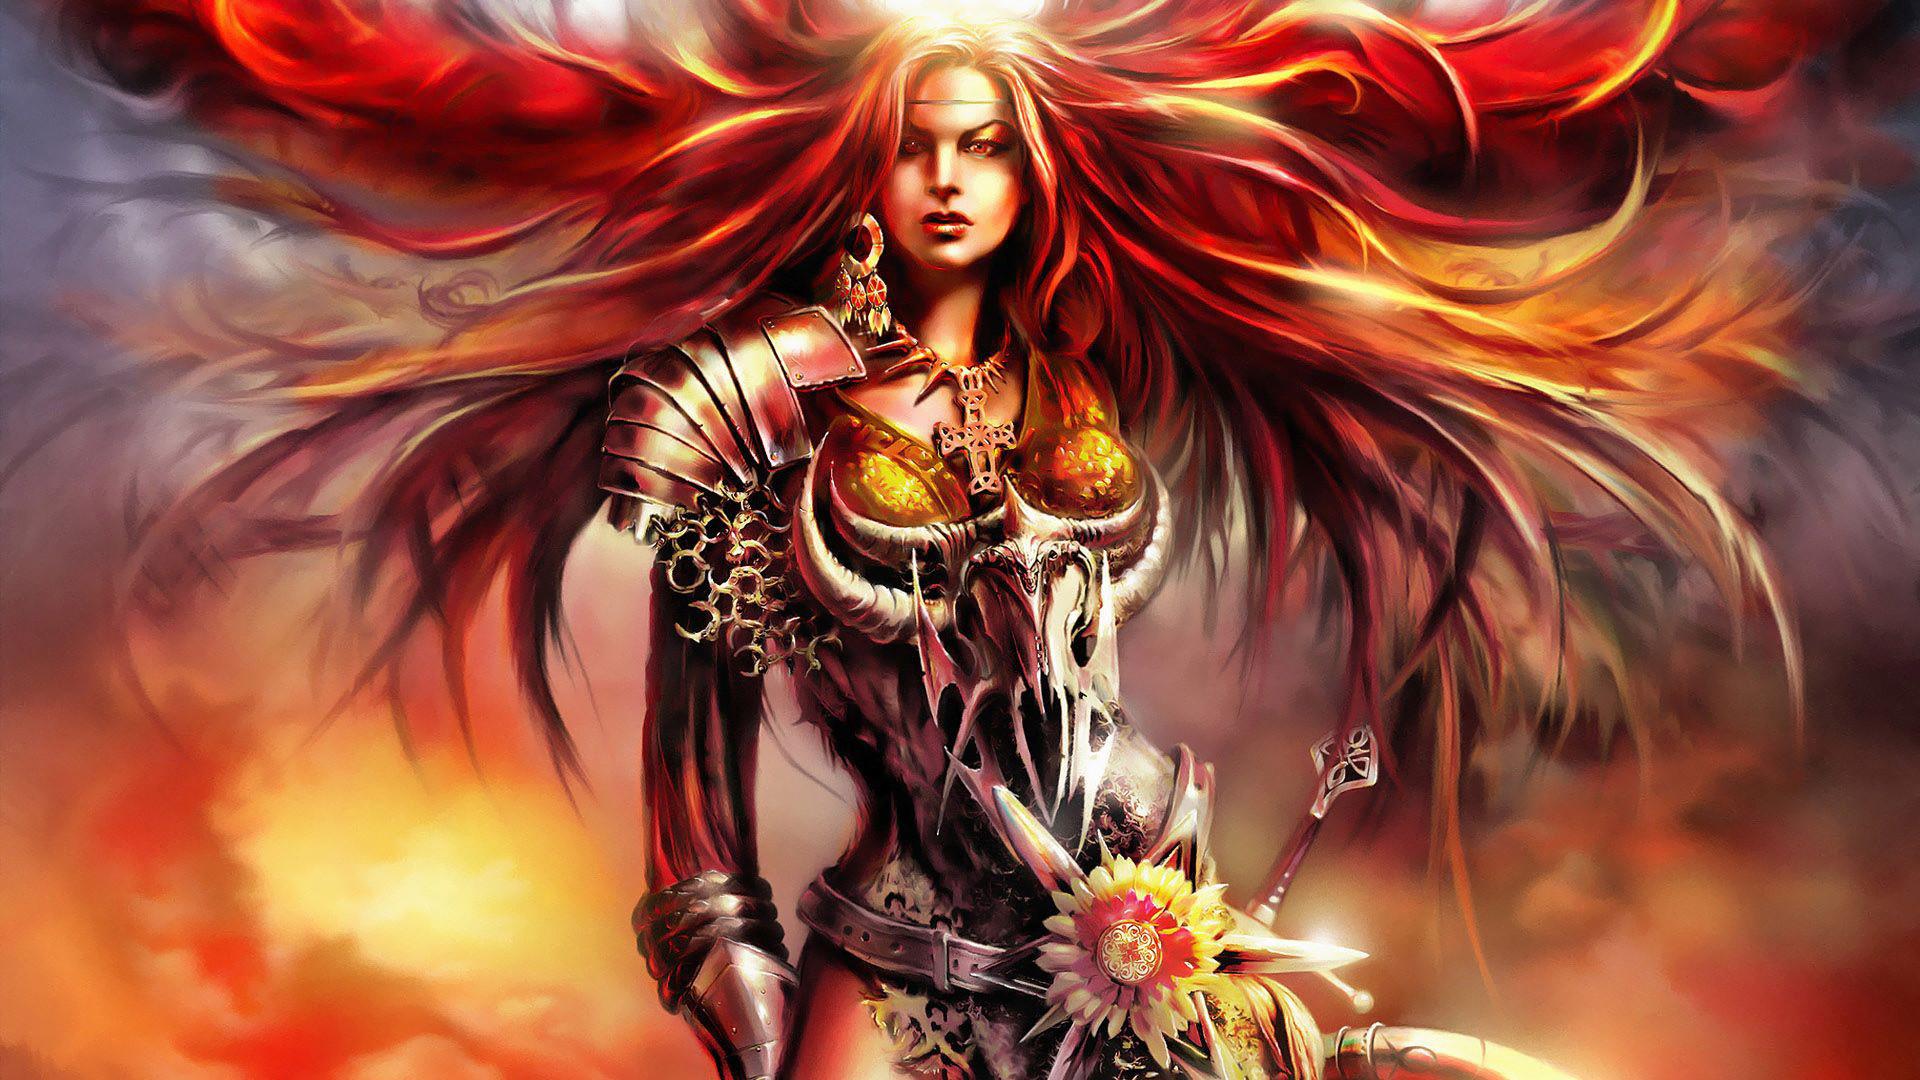 Fantasy – Women Warrior Red Hair Fantasy Woman Warrior Woman Girl Armor  Long Hair Red Eyes